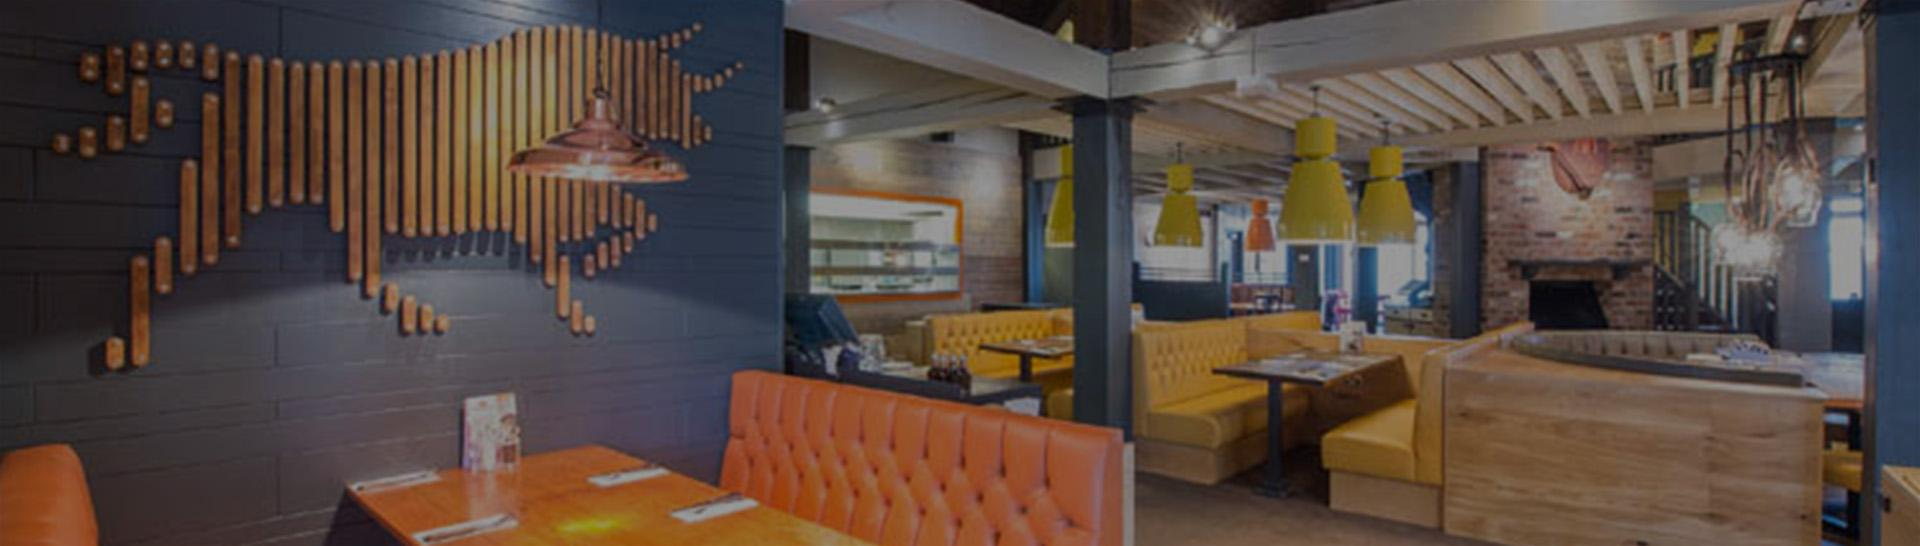 Whitbread Restaurants Yext Co Uk